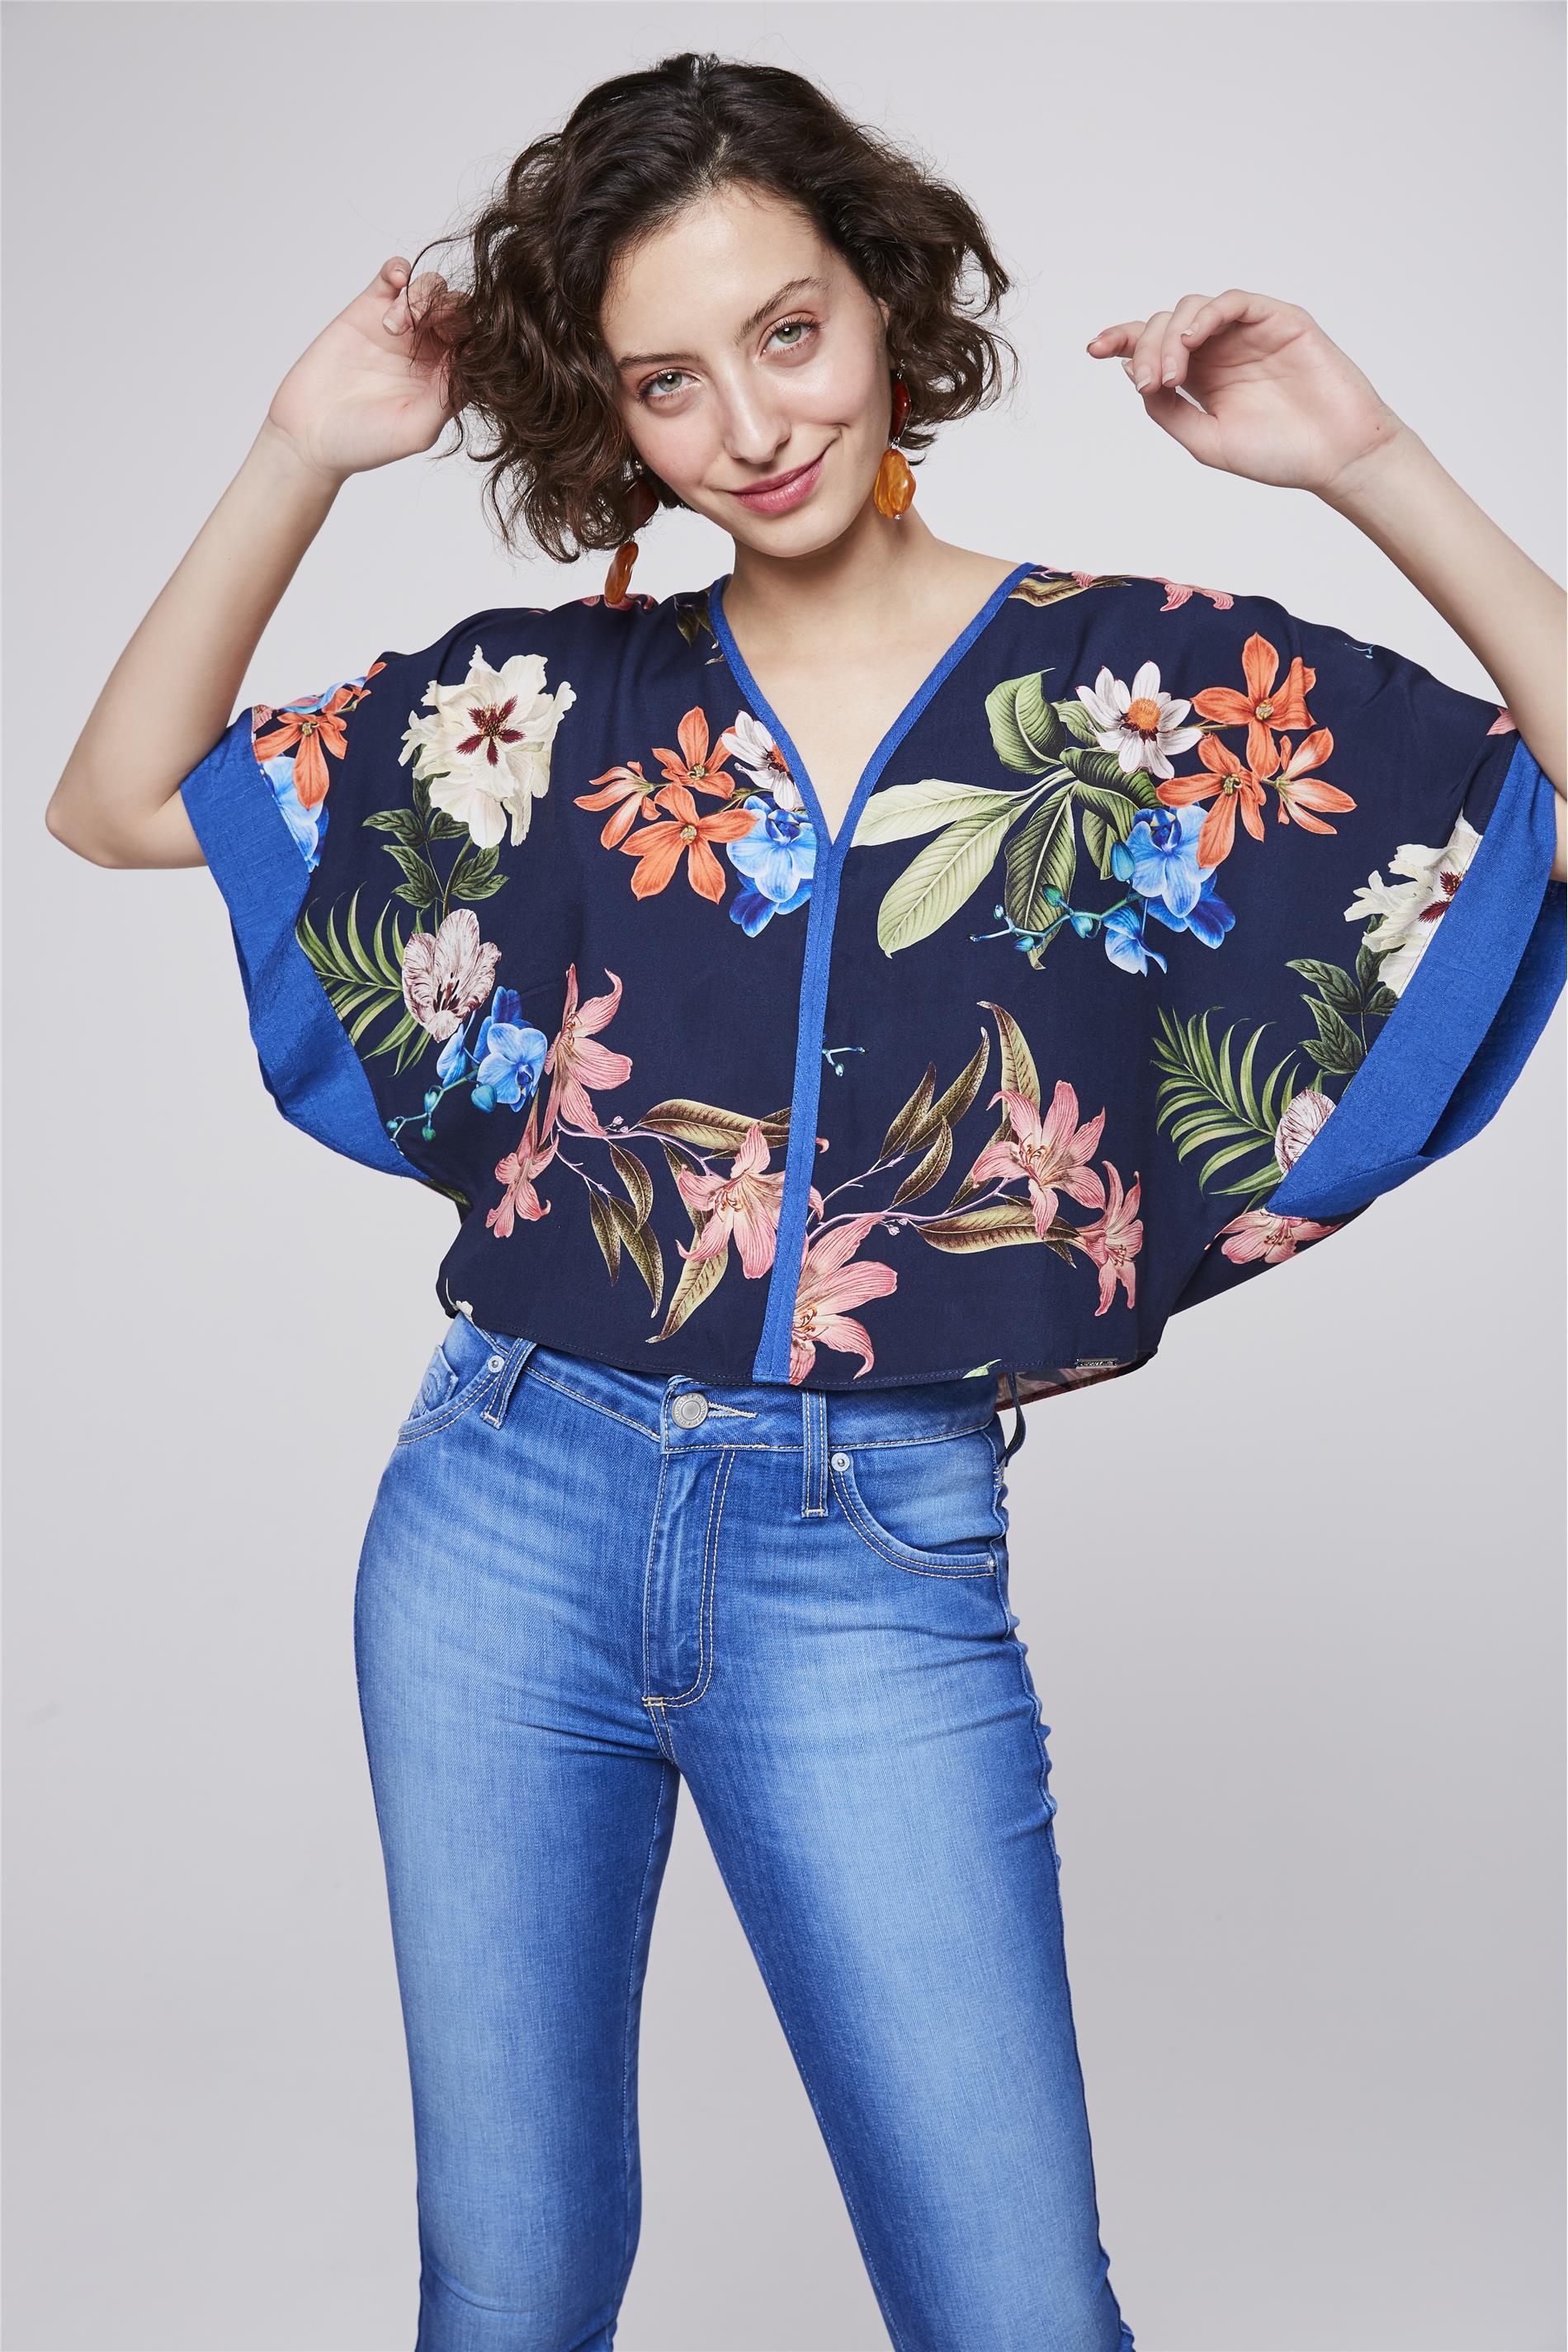 1b1d1c279 Blusa Floral com Decote V Feminina - Damyller